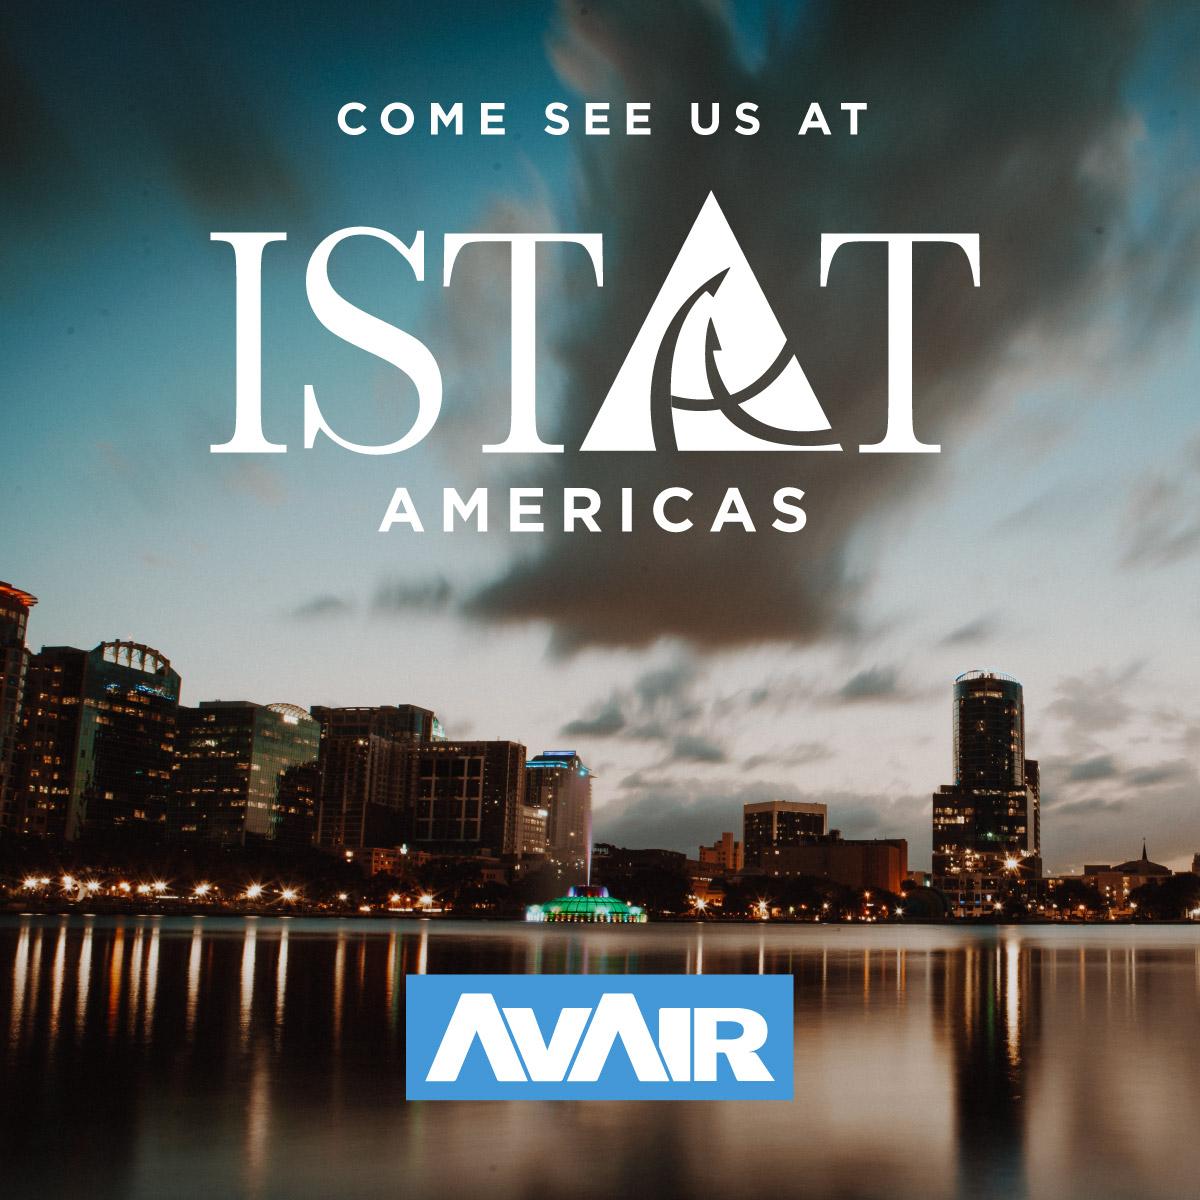 AvAir_ISTAT_Orlando2-sr0228019